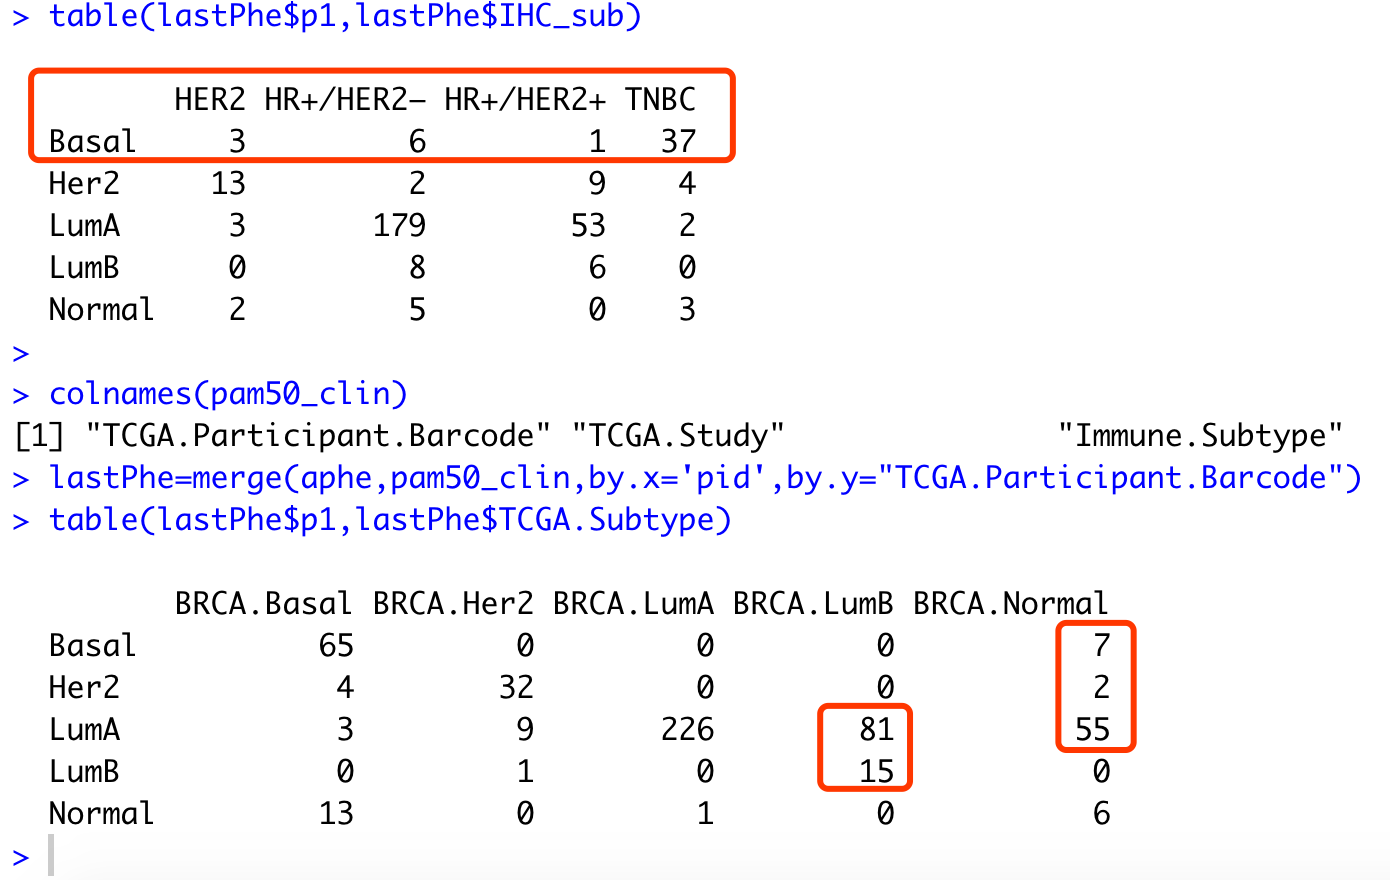 TNBC和basel的重合度非常高